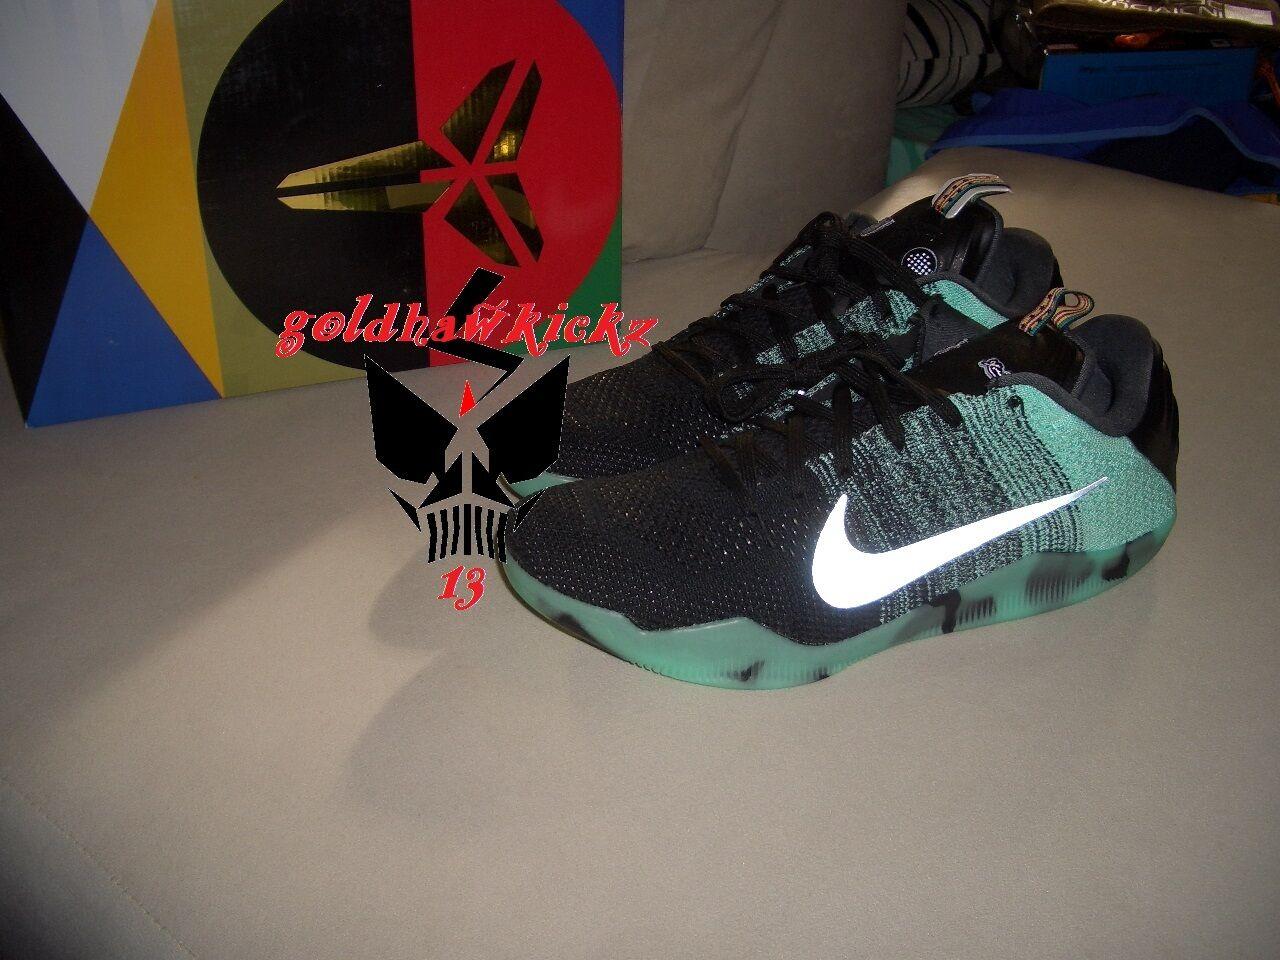 Nike Kobe XI 11 Elite Low AS GLOW All Star Game GREEN GLOW AS 822521-305 GITD toronto e4b055